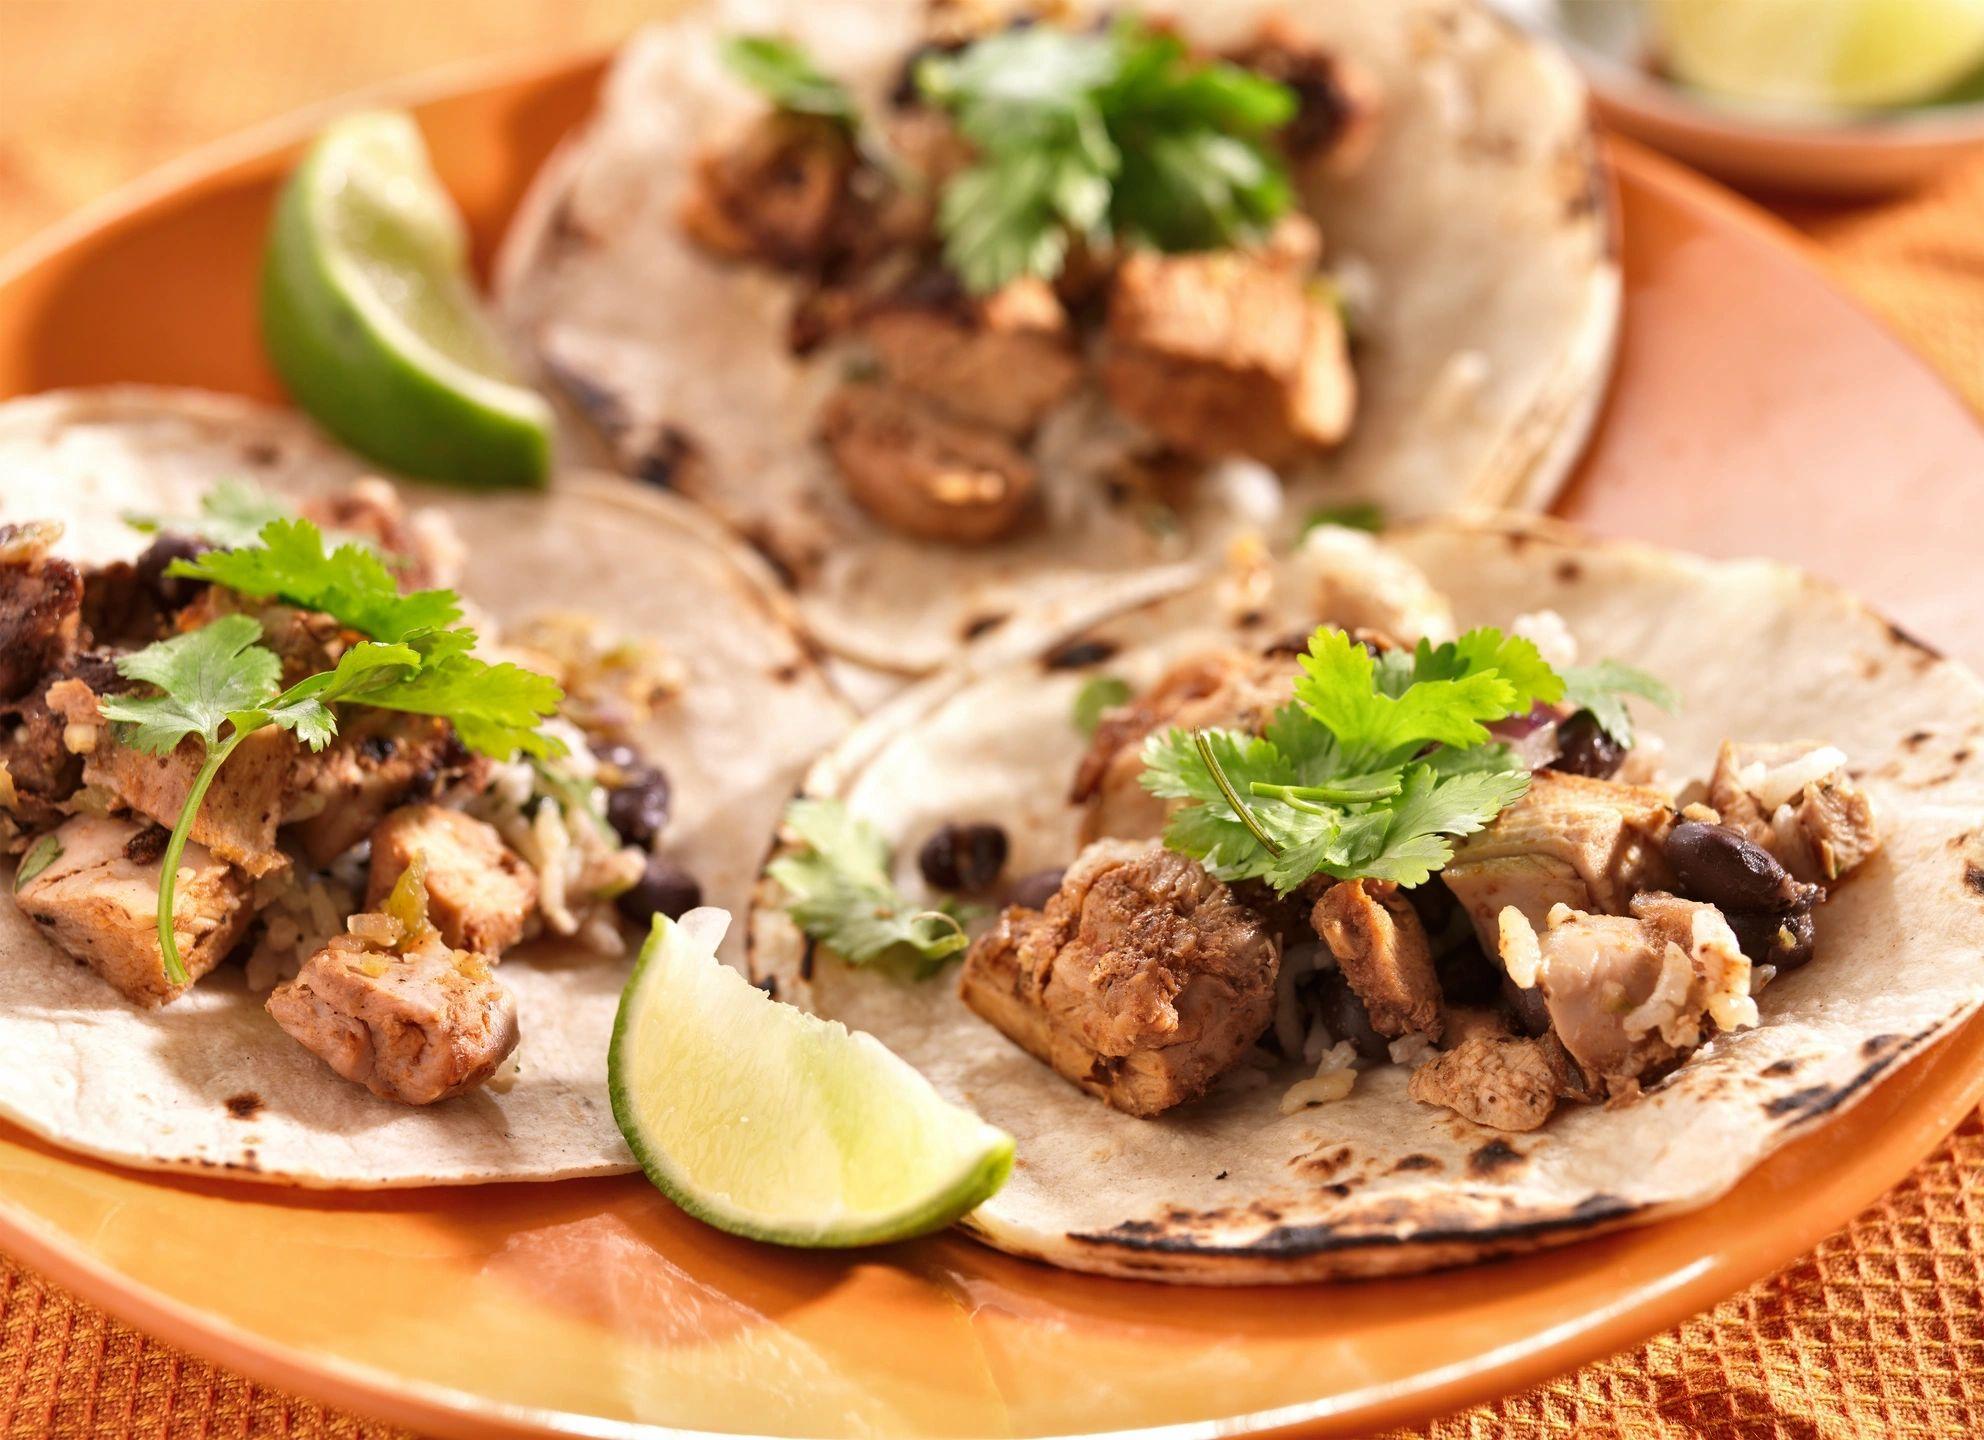 FORC restaurant allen hess goat tacos